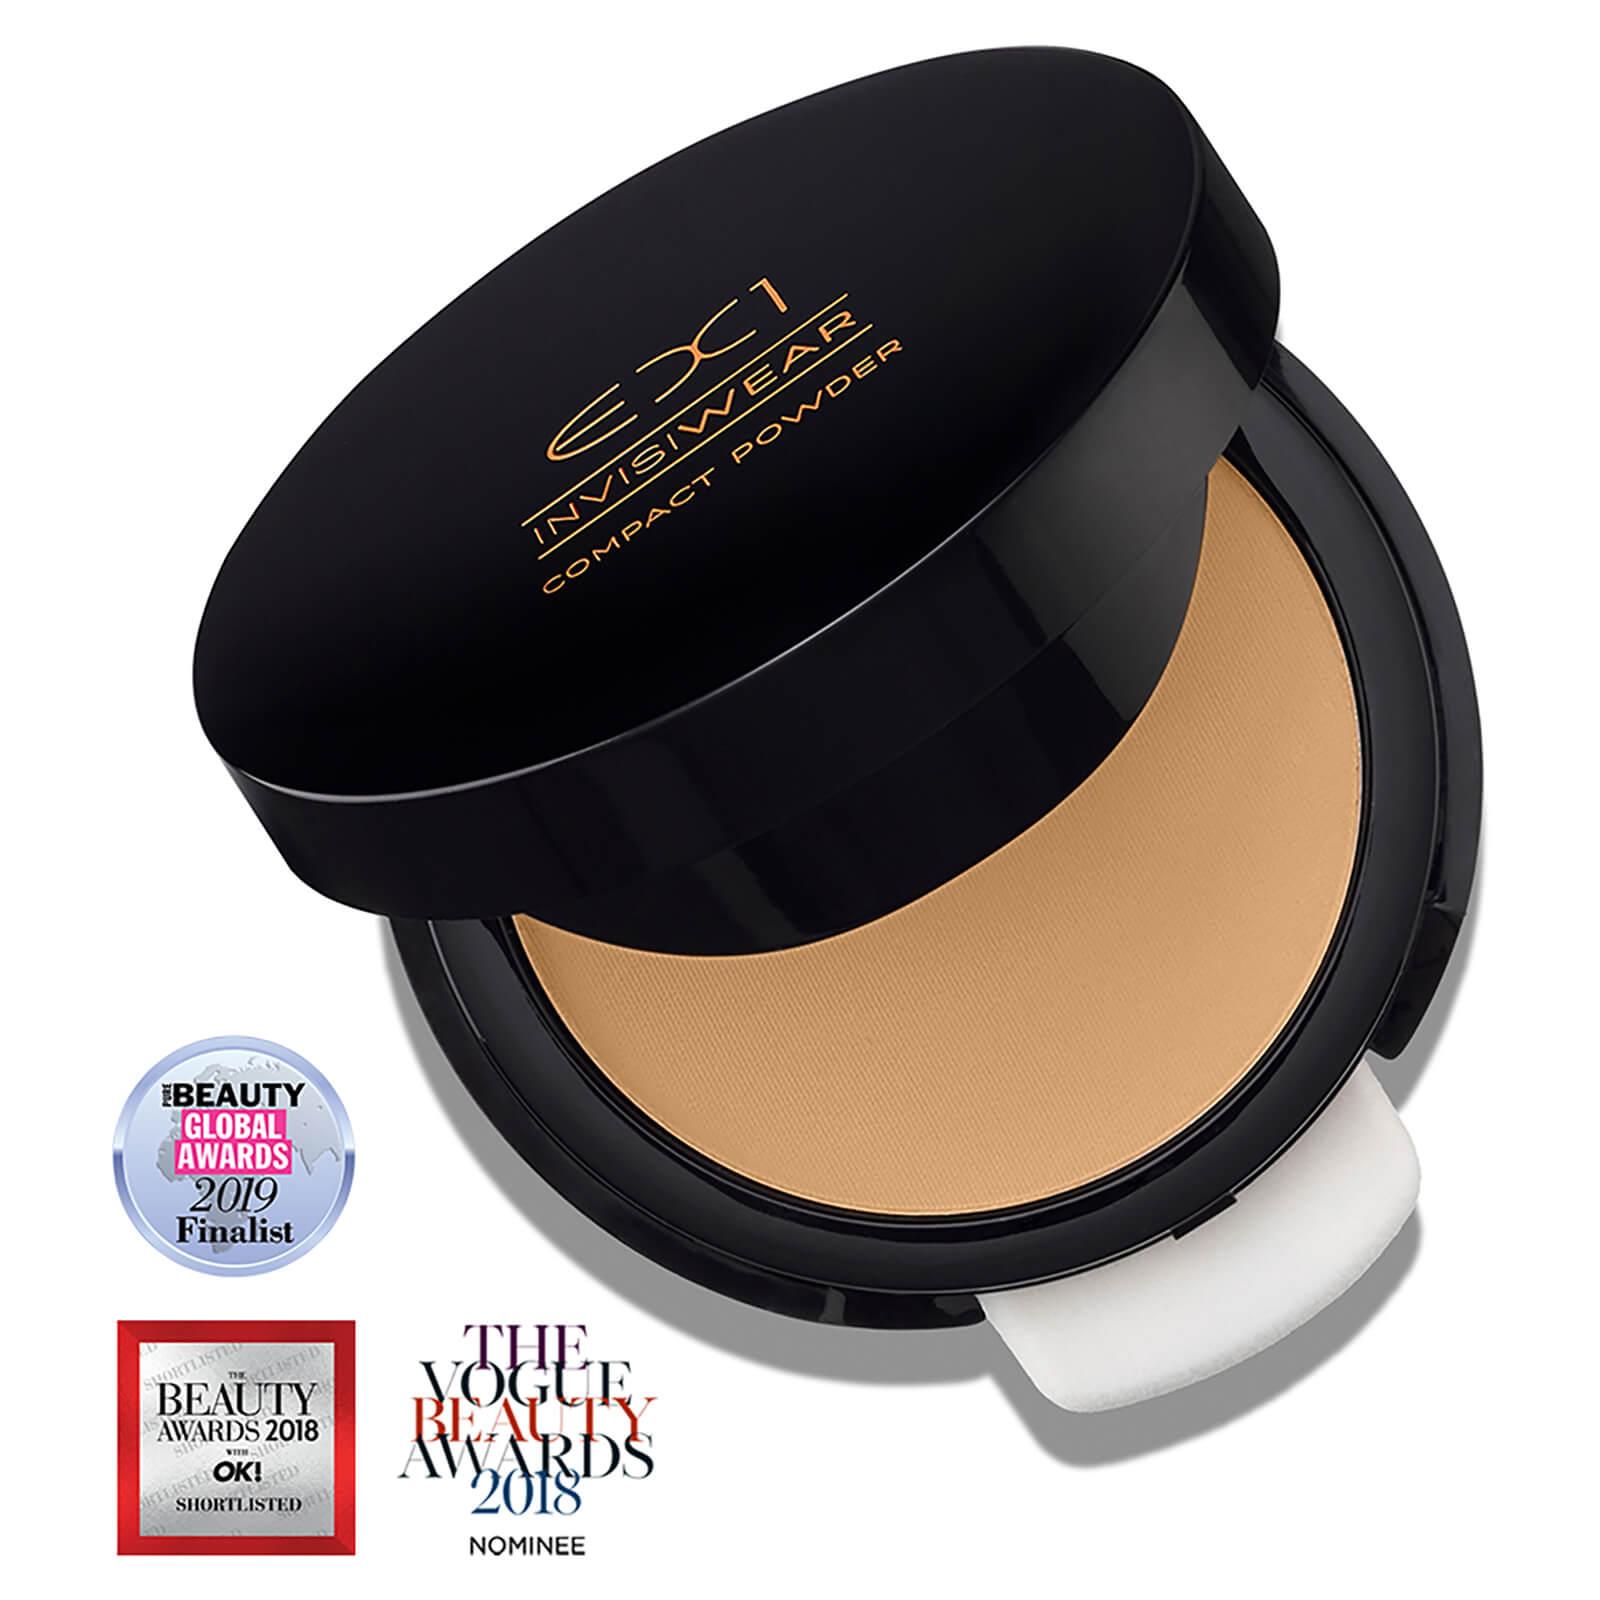 EX1 Cosmetics Compact Powder 9.5g (Various Shades) - 6.0